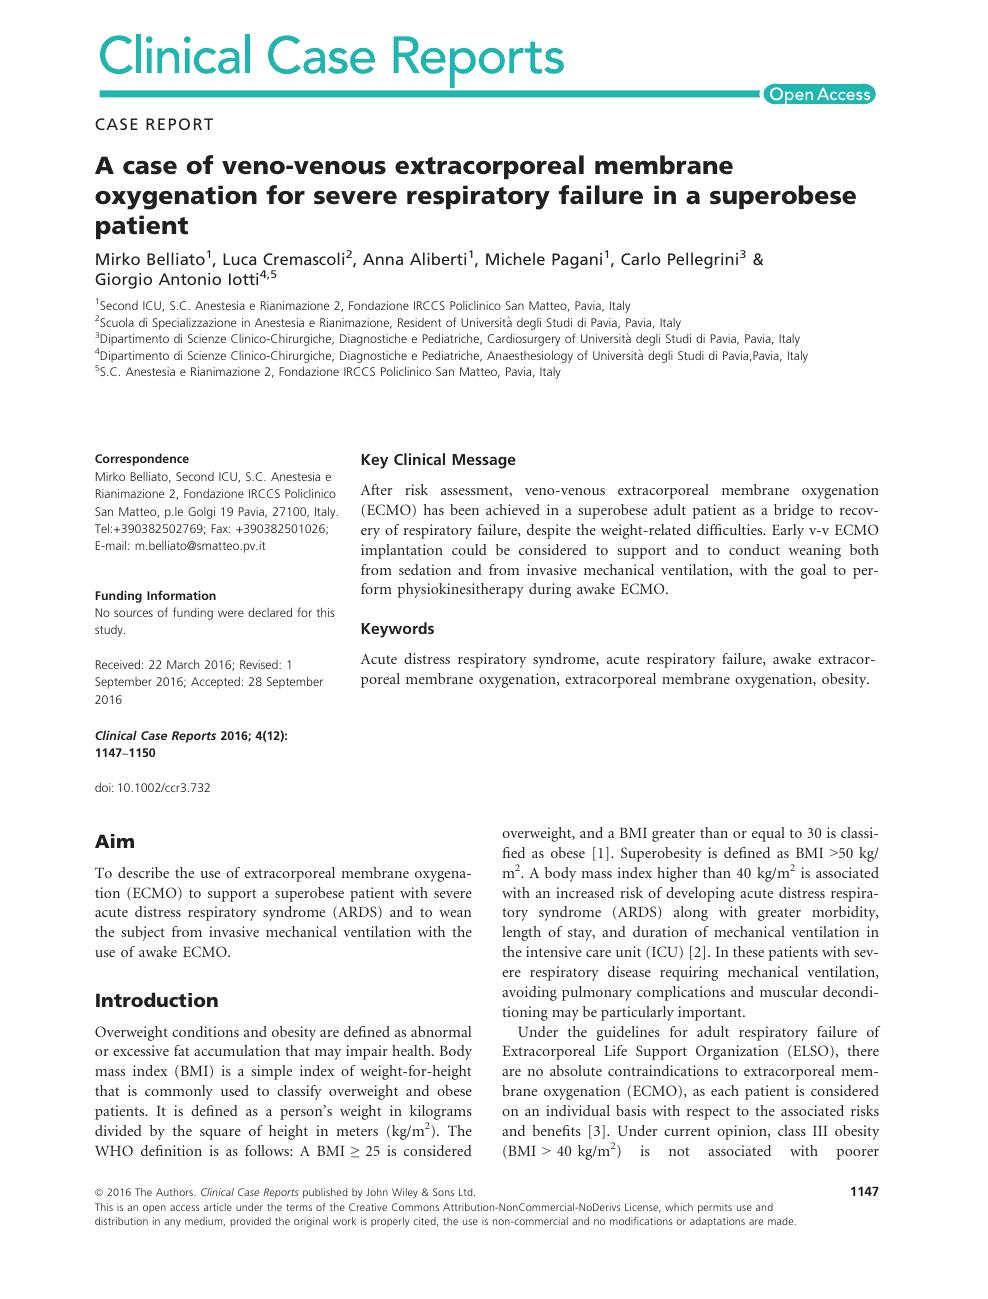 A case of veno-venous extracorporeal membrane oxygenation